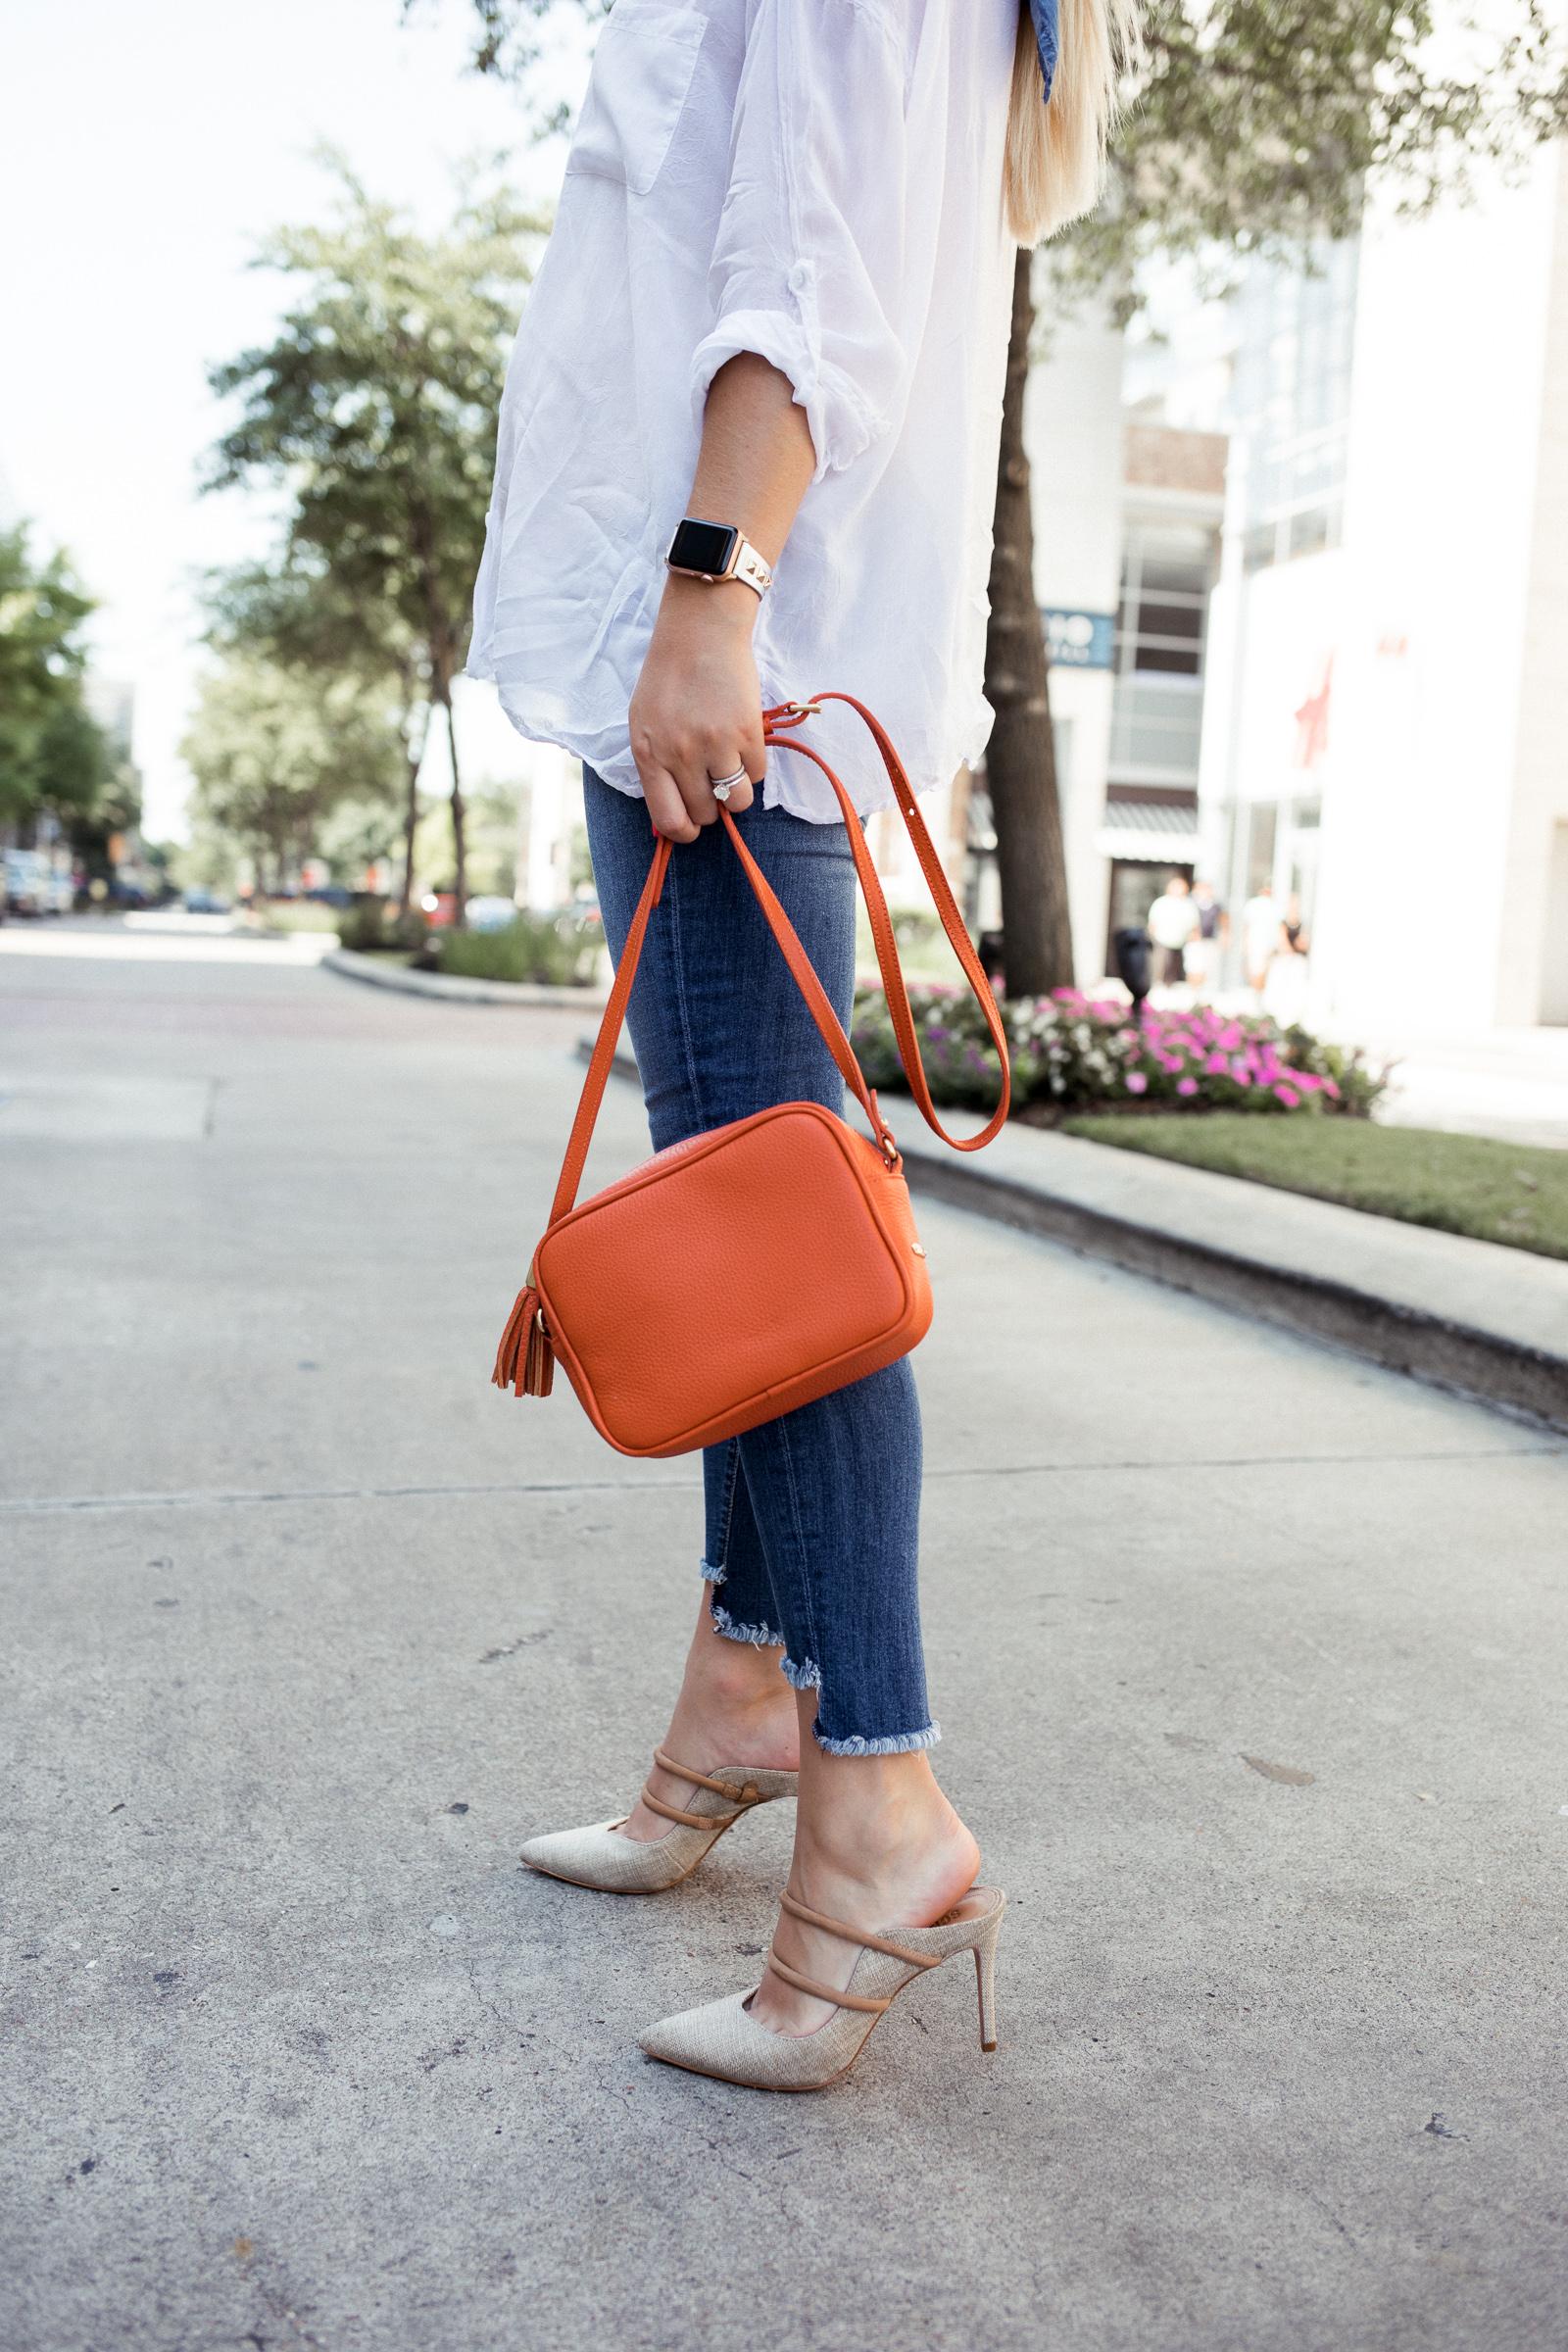 Houston fashion blogger Elly Brown wears a Gigi New York crossbody bag with Schutz nude heels